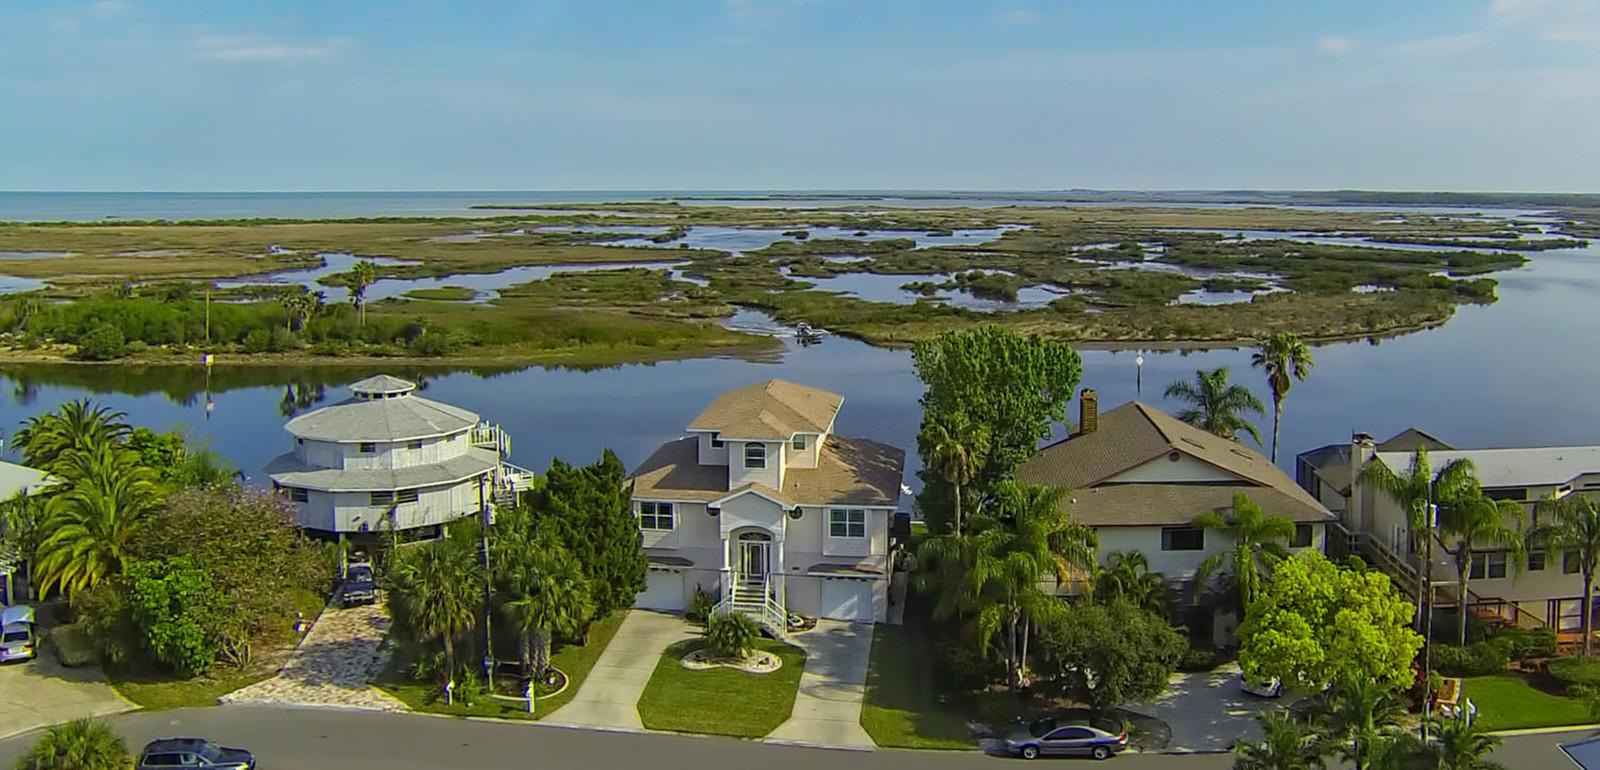 Hernando Beach - houses aerial photo